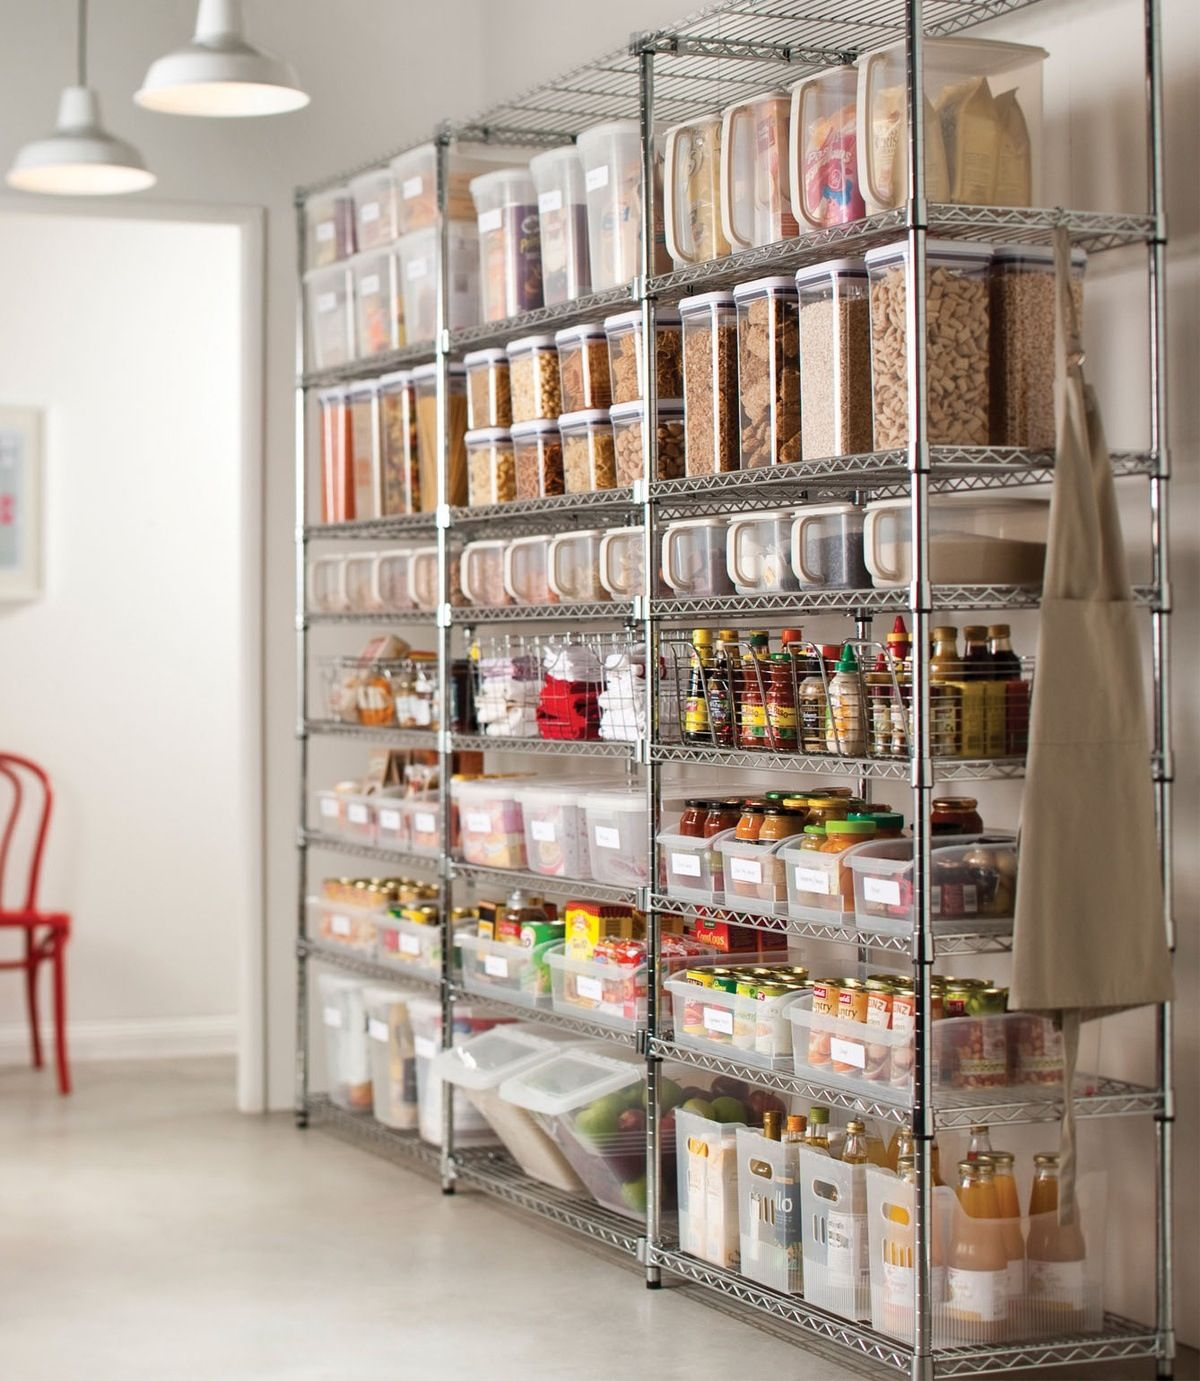 34 Insanely Smart DIY Kitchen Storage Ideas | Almacenamiento, Orden ...